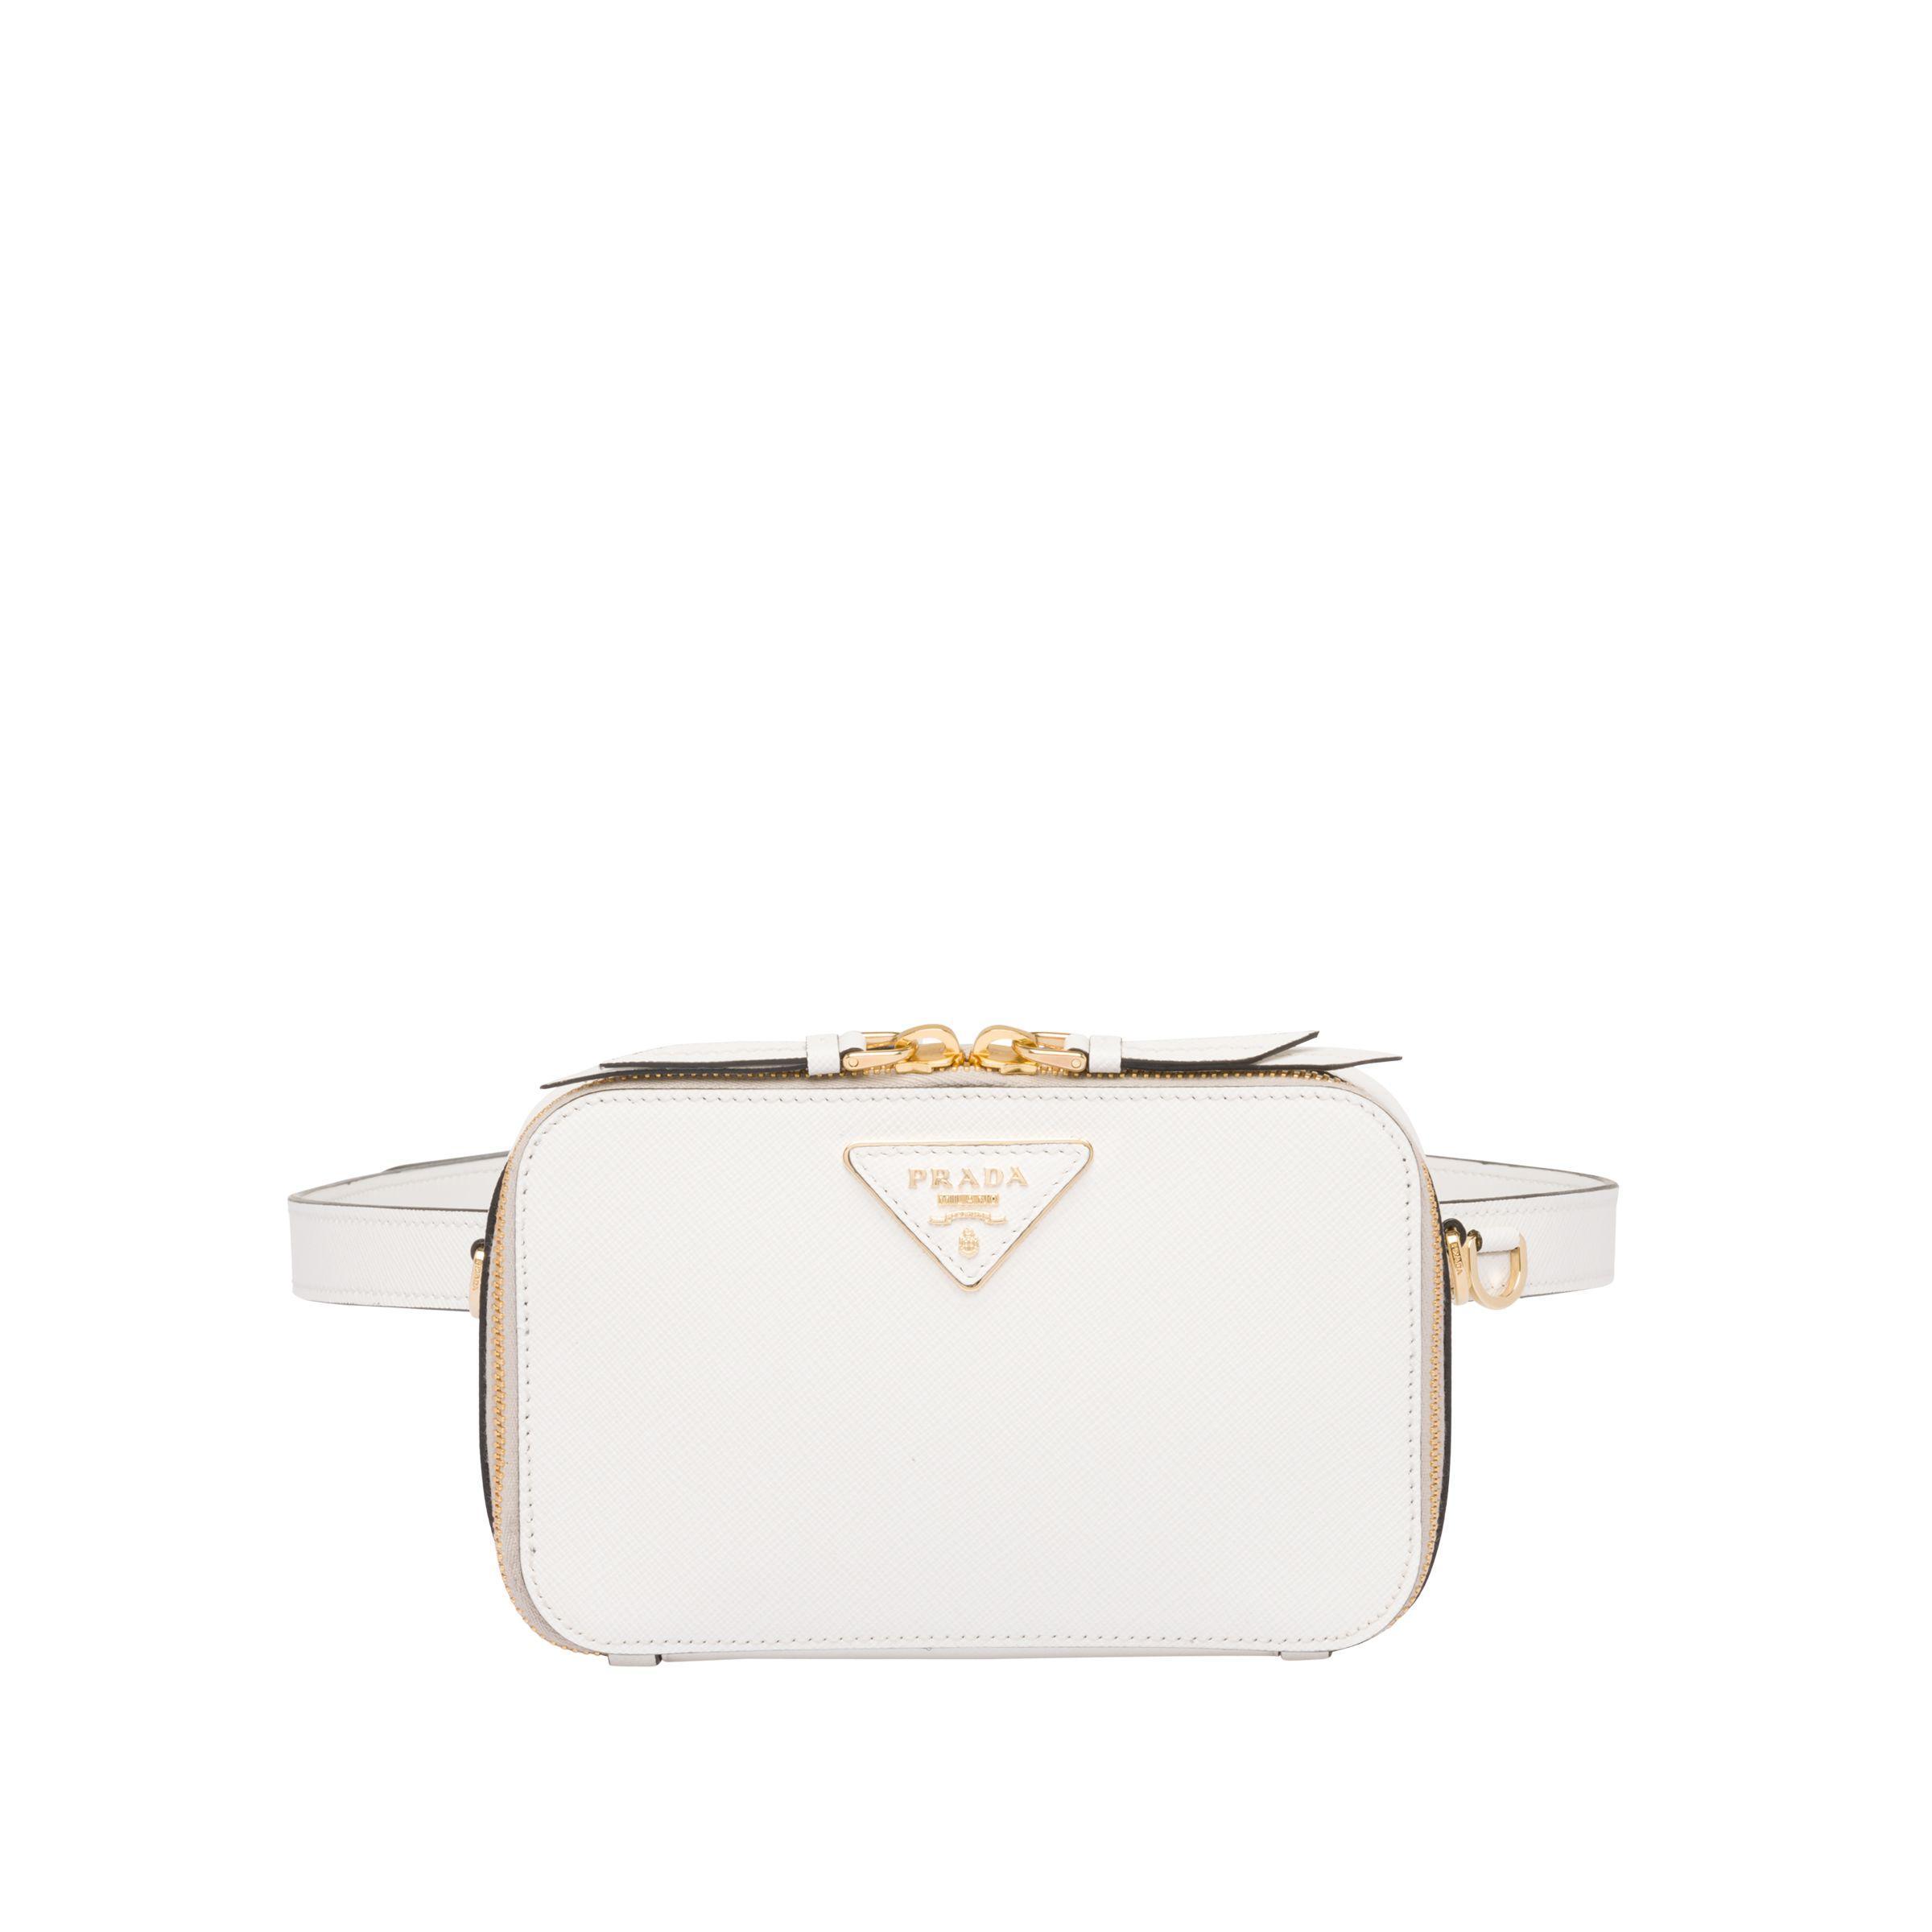 323e586afbea62 Prada. Women's Odette Saffiano Leather Belt Bag. $1,270 From Orchard Mile